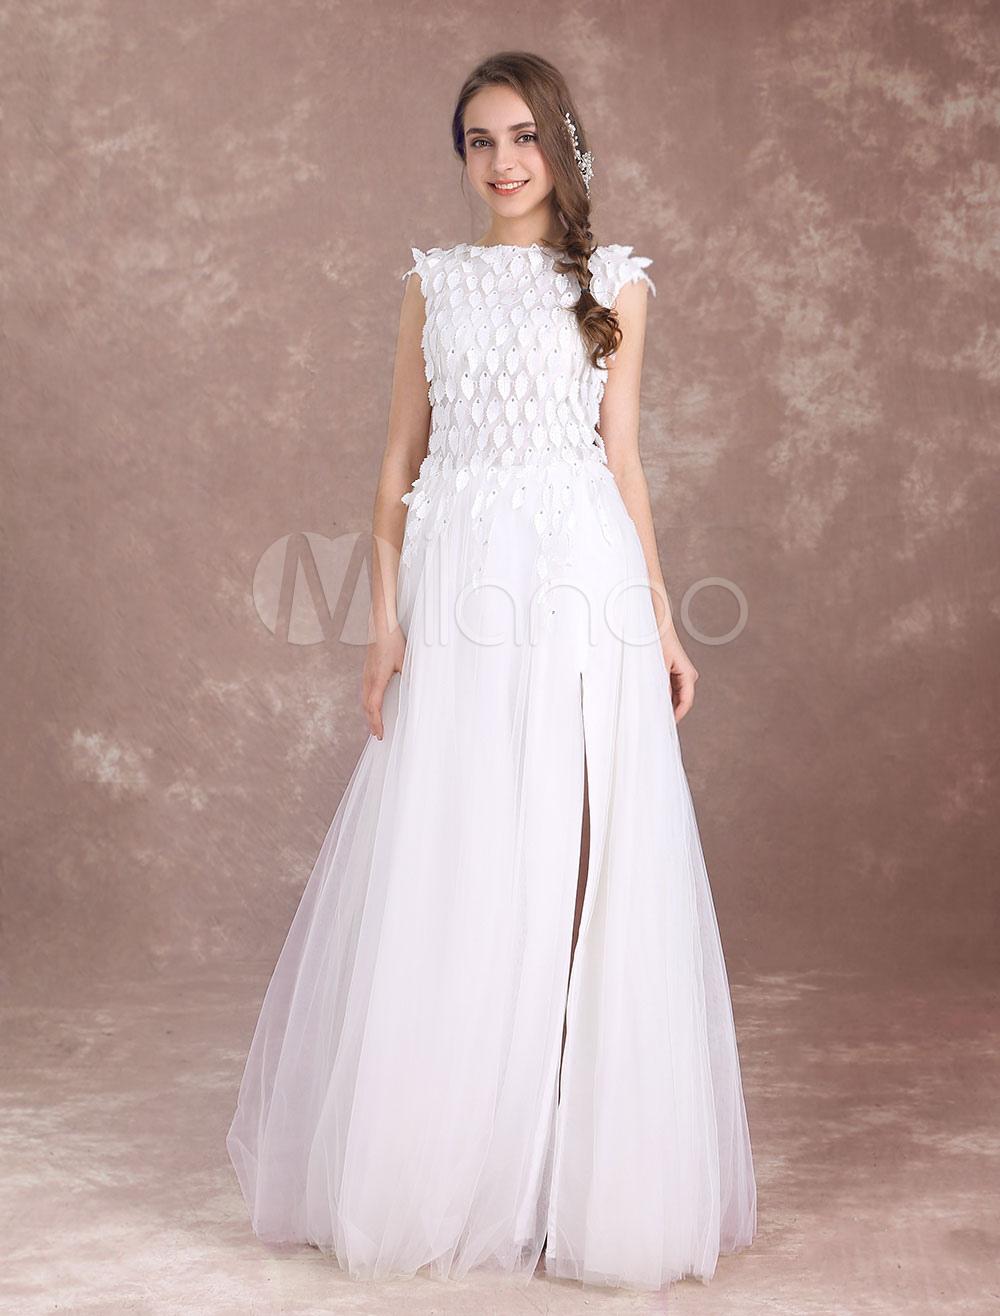 Beach Wedding Dresses High Split Boho Bridal Gown Bateau Leaf Beaded Ivory Floor Length Summer Bridal Dress